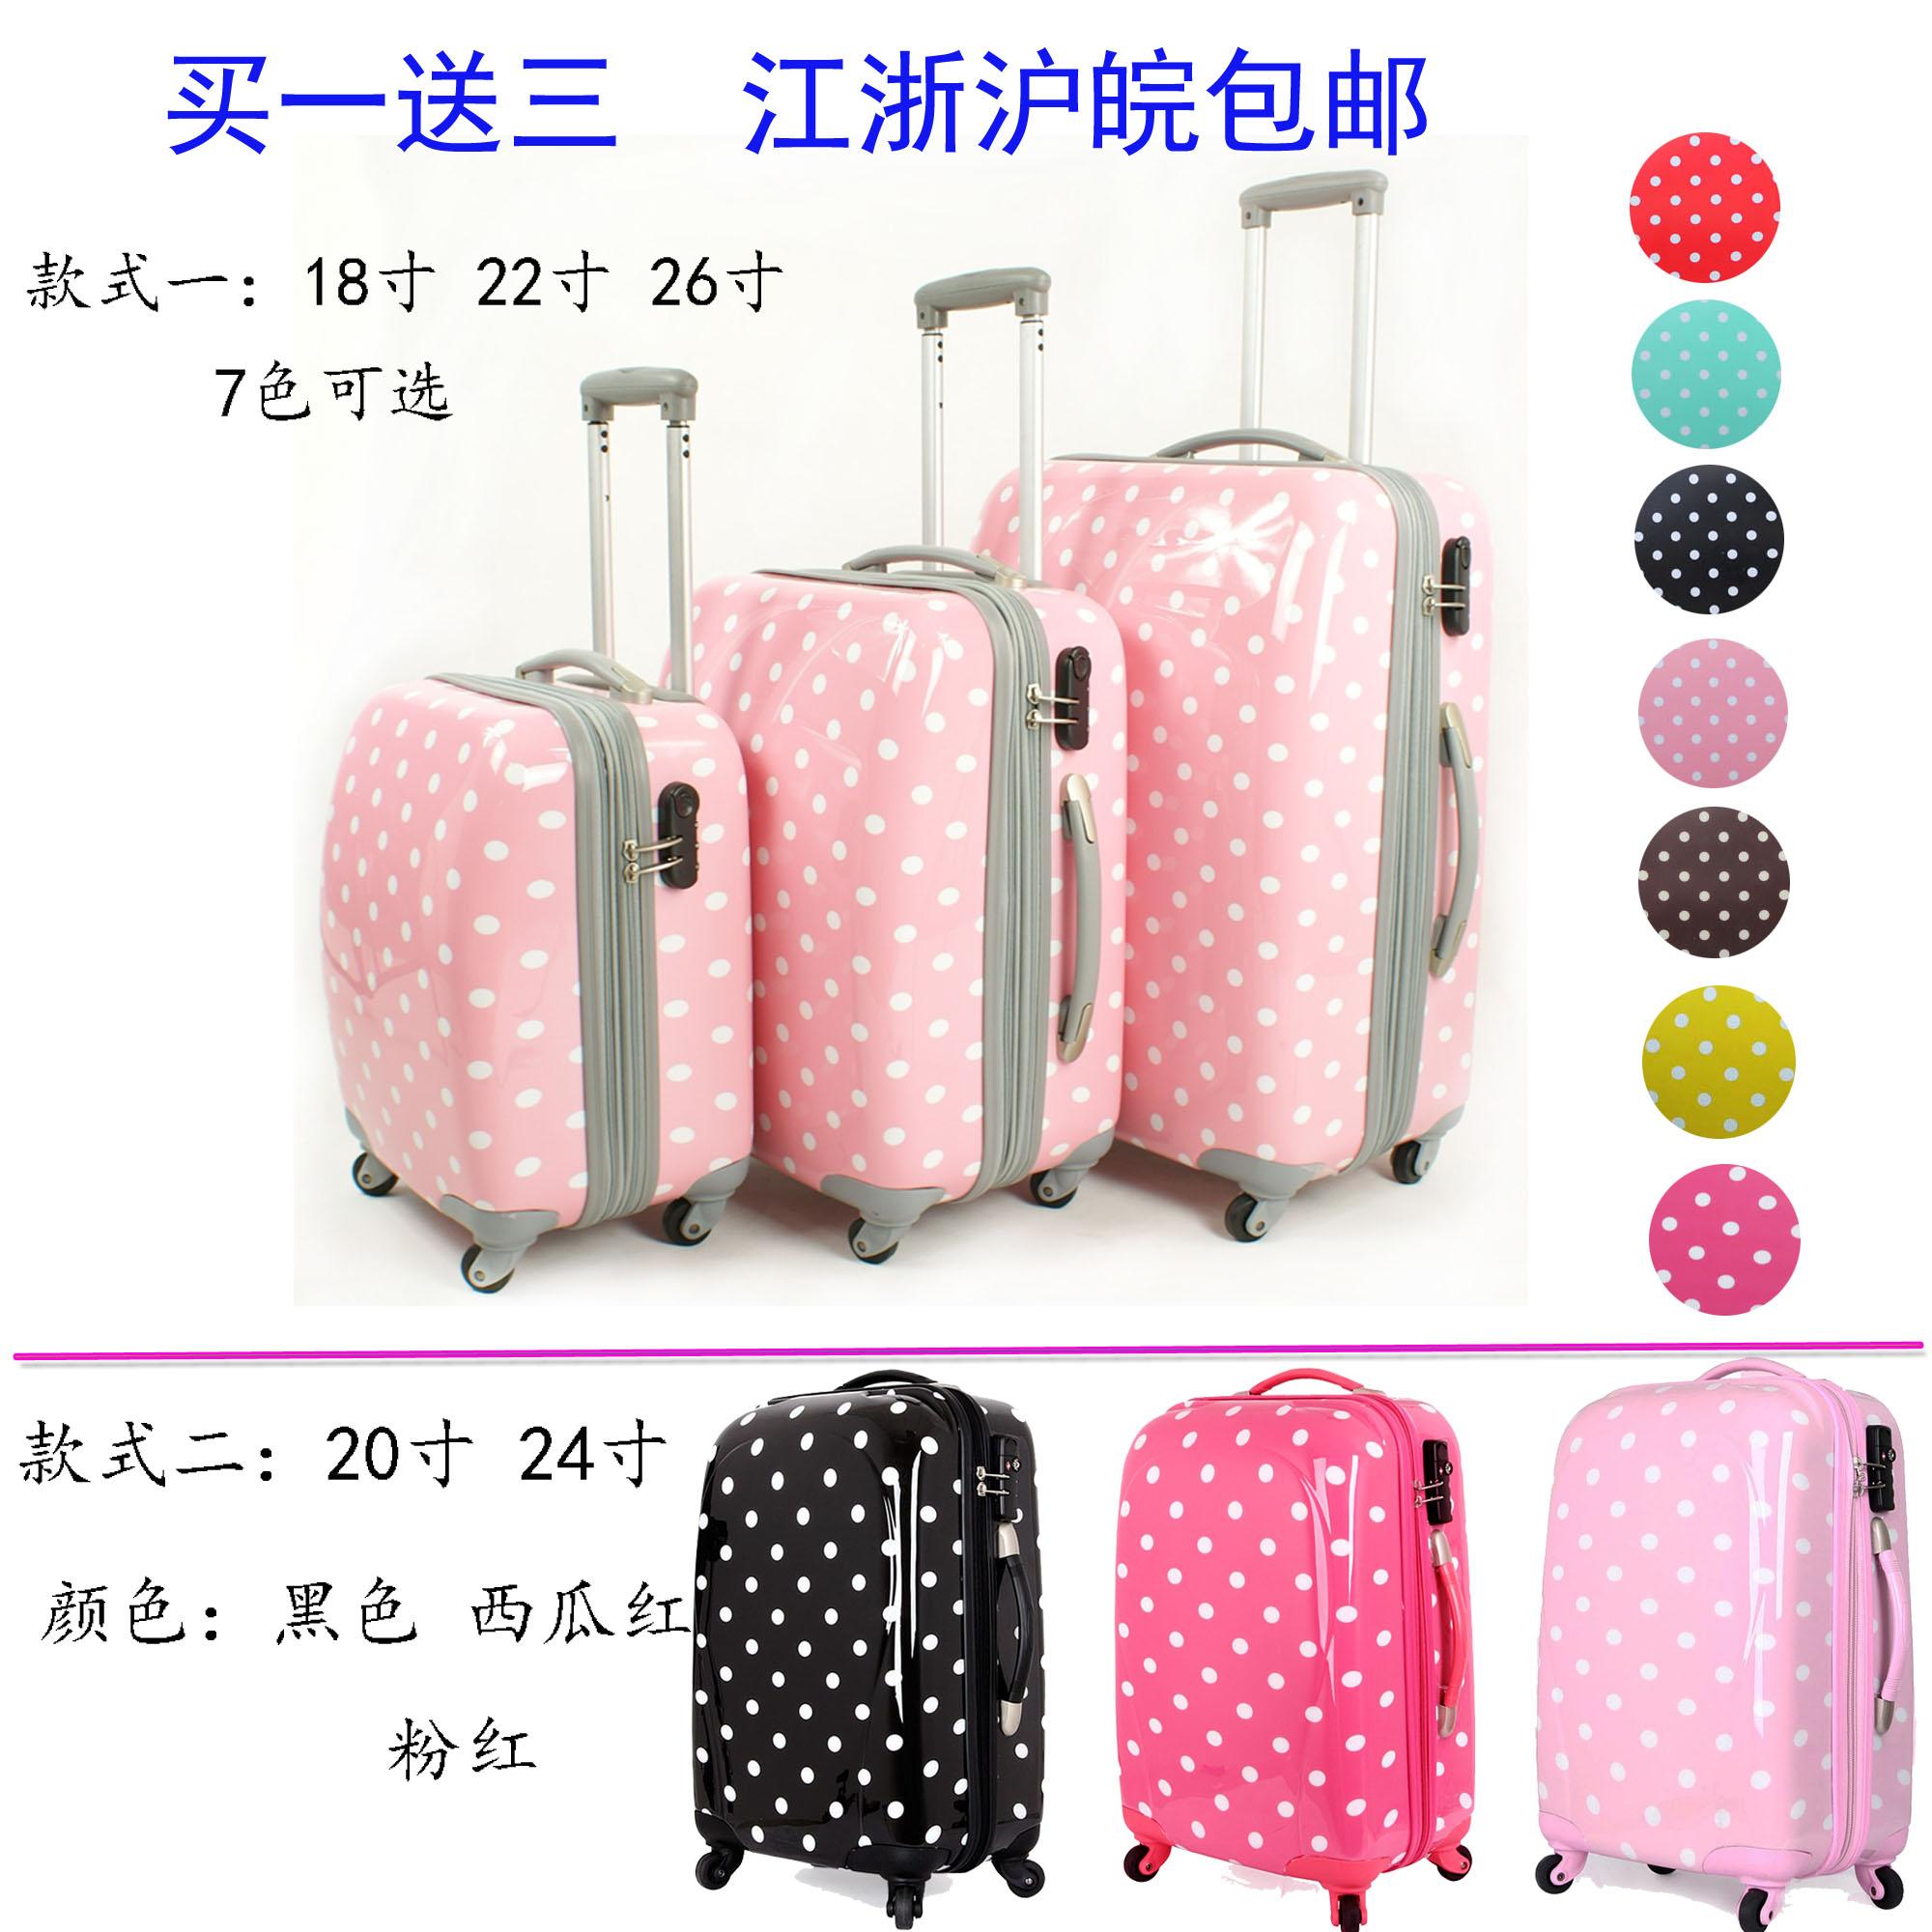 Abs pc trolley luggage female polka dot travel bag universal wheels 18 20 22 24 26inch,female lovely